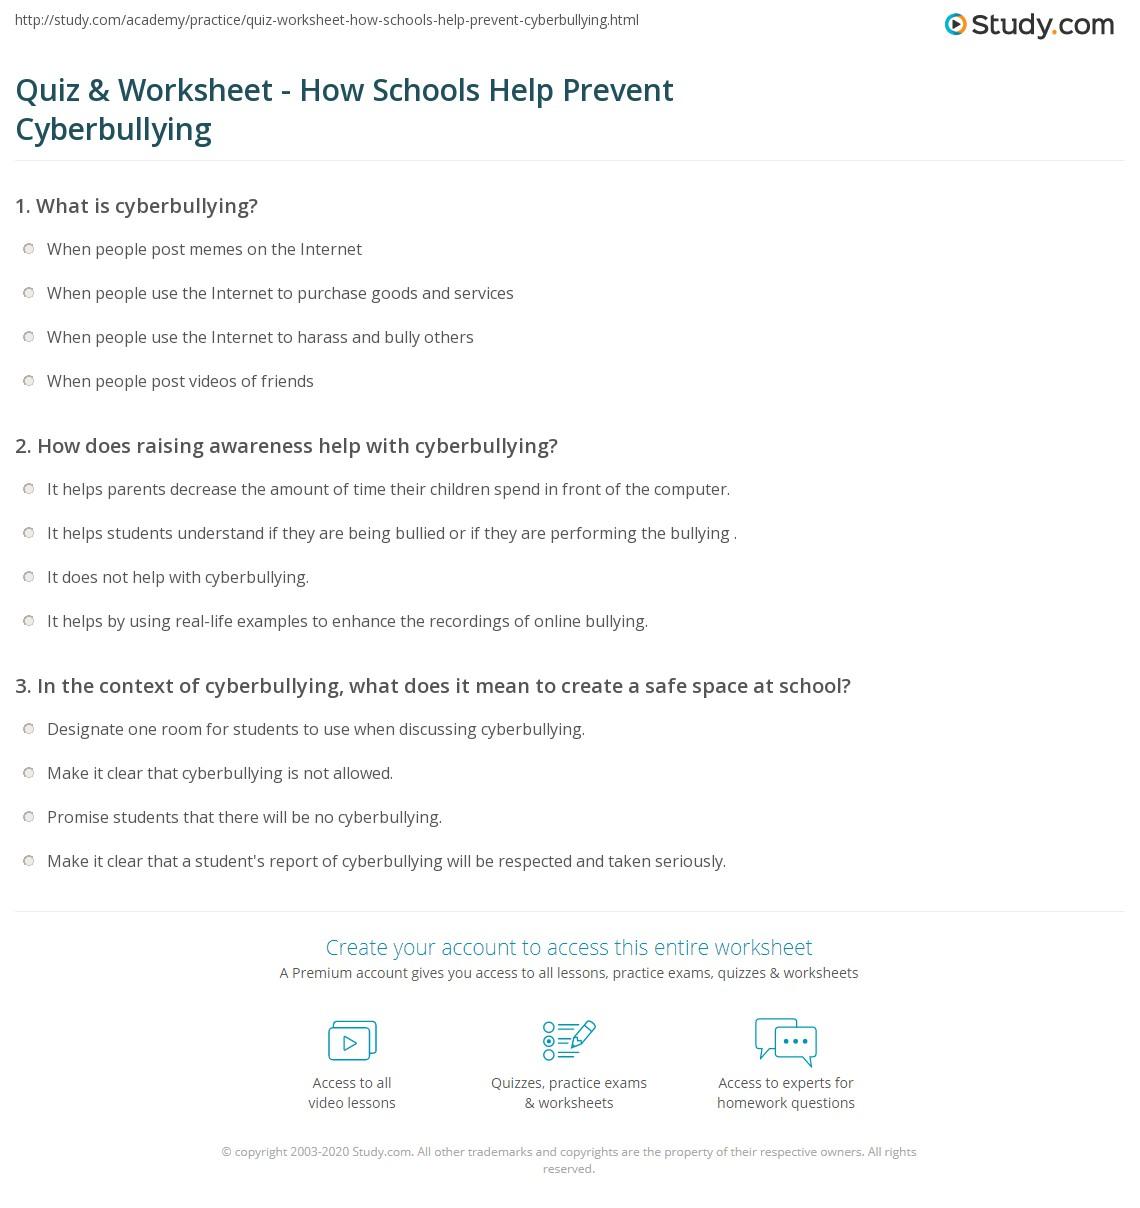 Quiz Worksheet How Schools Help Prevent Cyberbullying Studycom